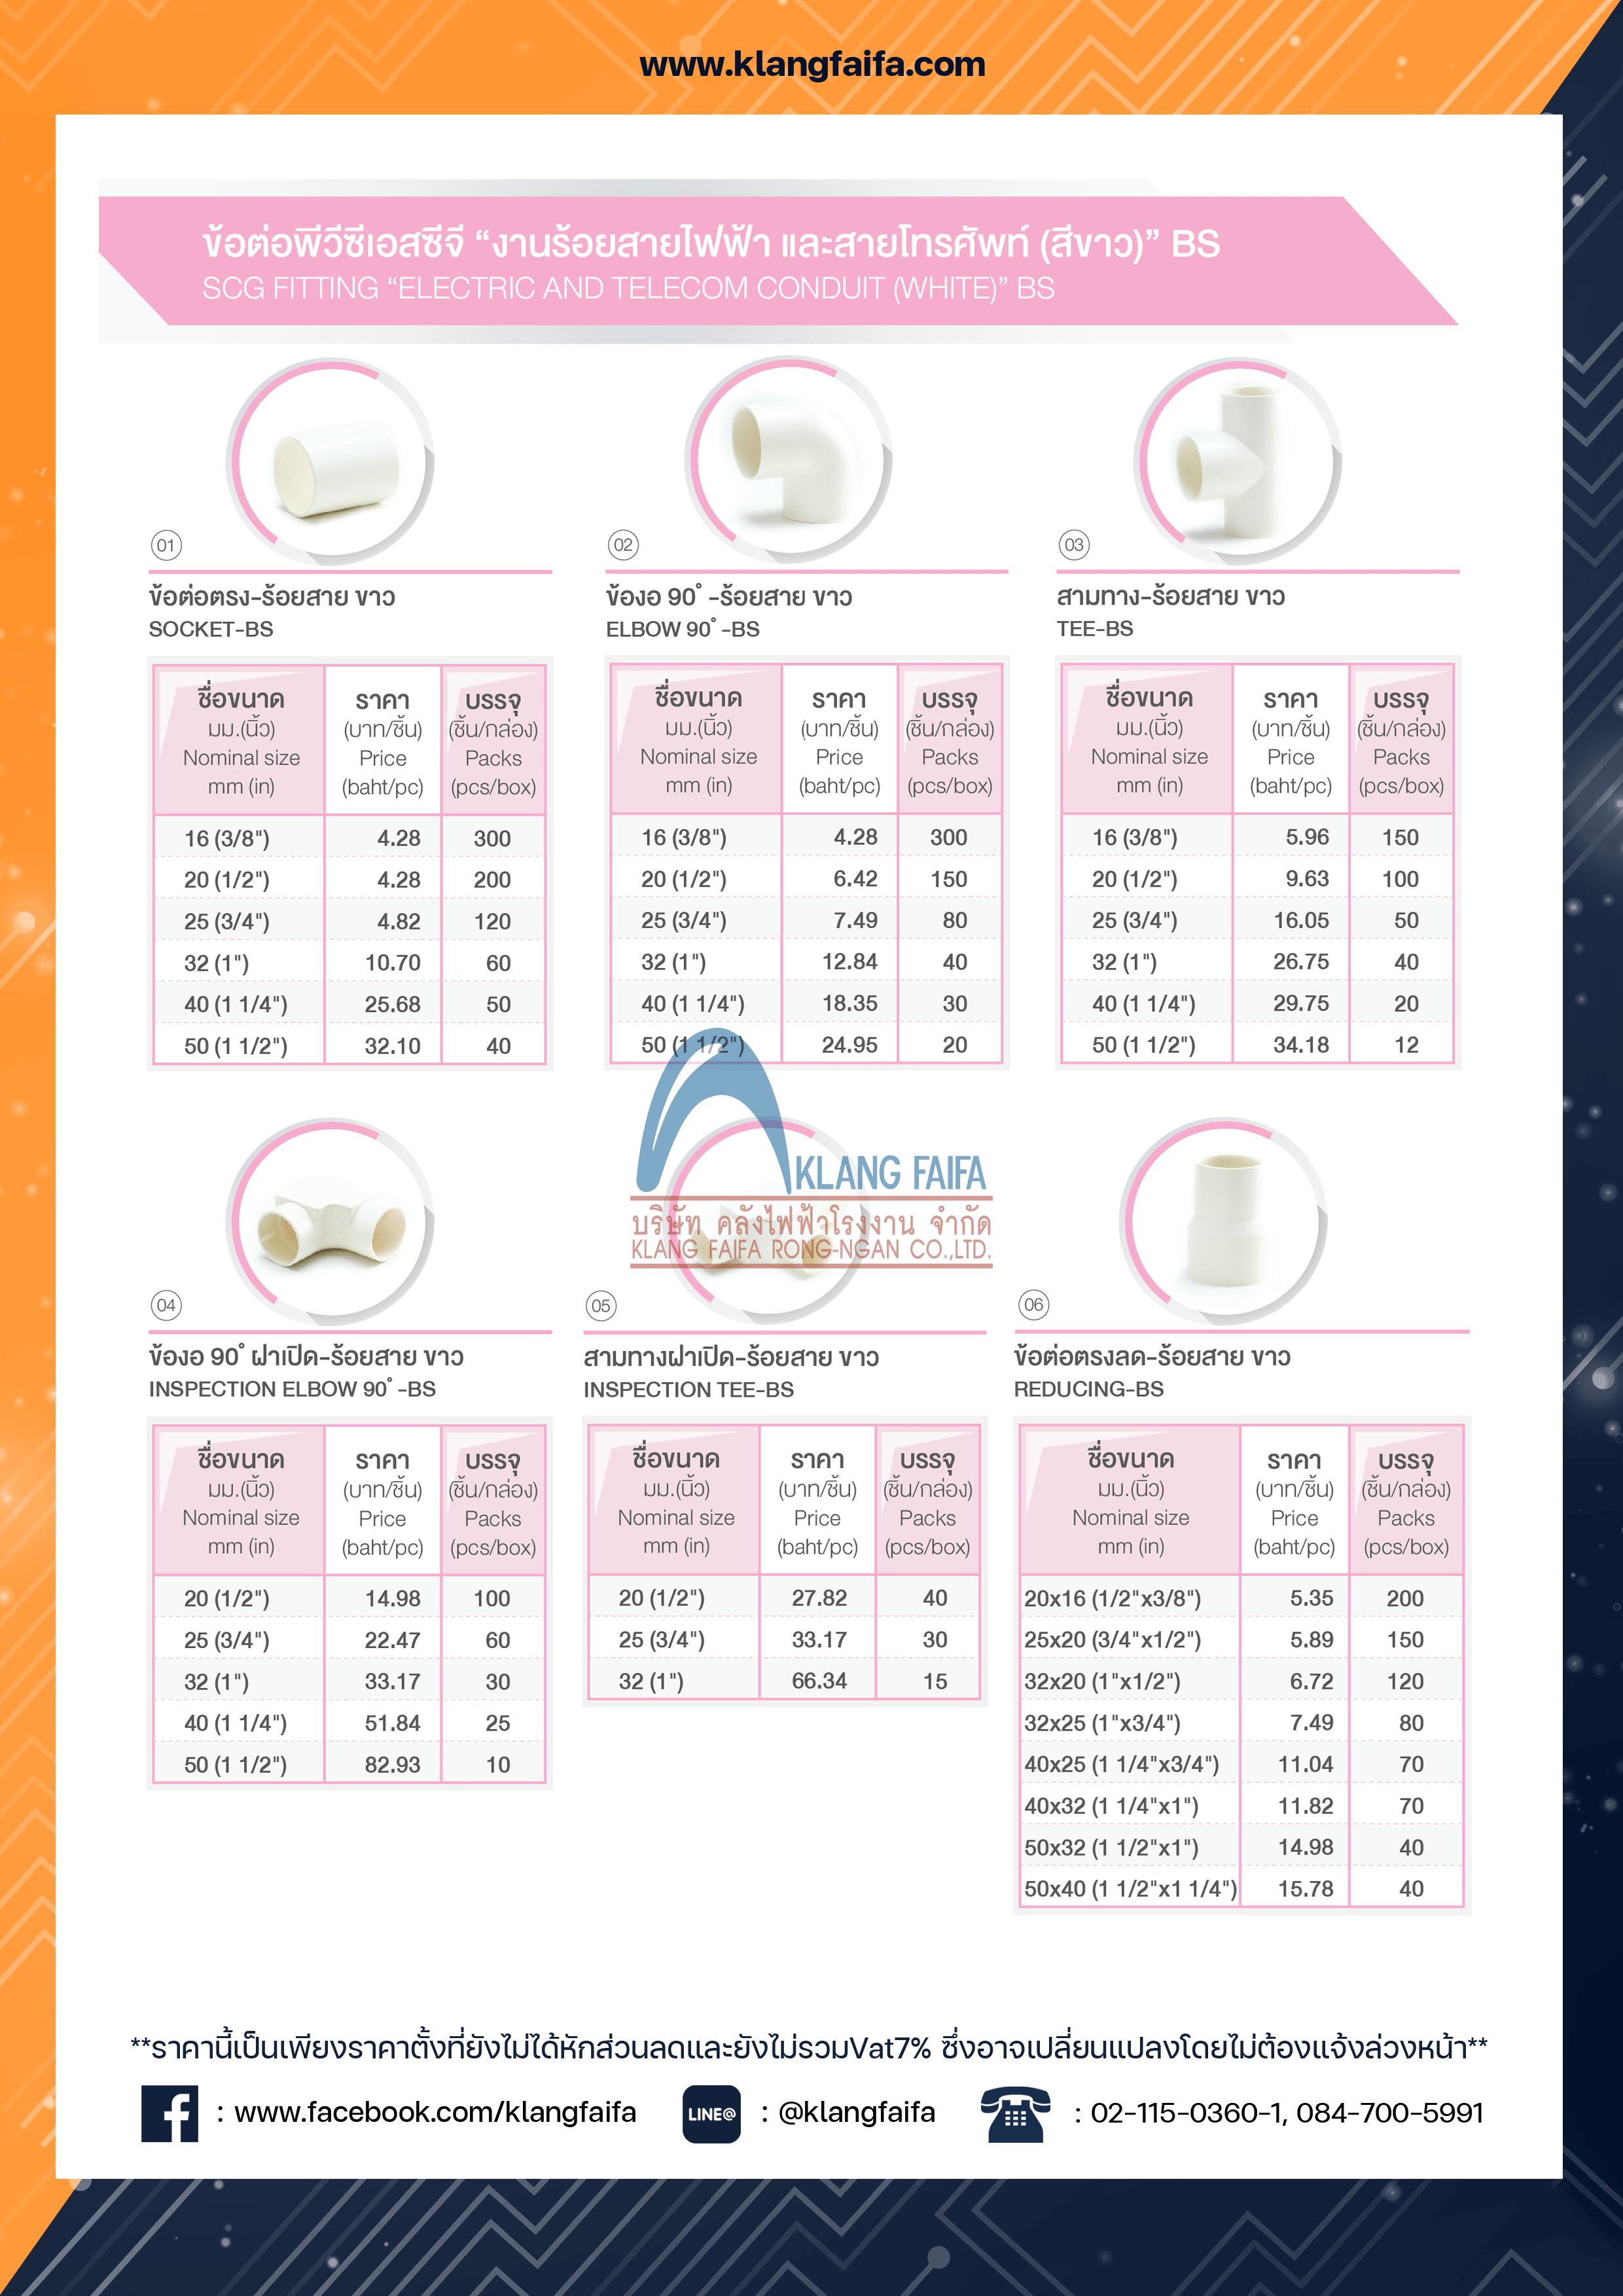 Catalog_SCG2021,ท่อยูพีวีซีสีขาว ตราช้างราคาถูก JIS Standard ท่อขาว, ท่อไฟ, ท่อสีขาว, ท่อยูพีวีซี, ท่อUPVCตราช้าง, ช้างขาว_JIS,